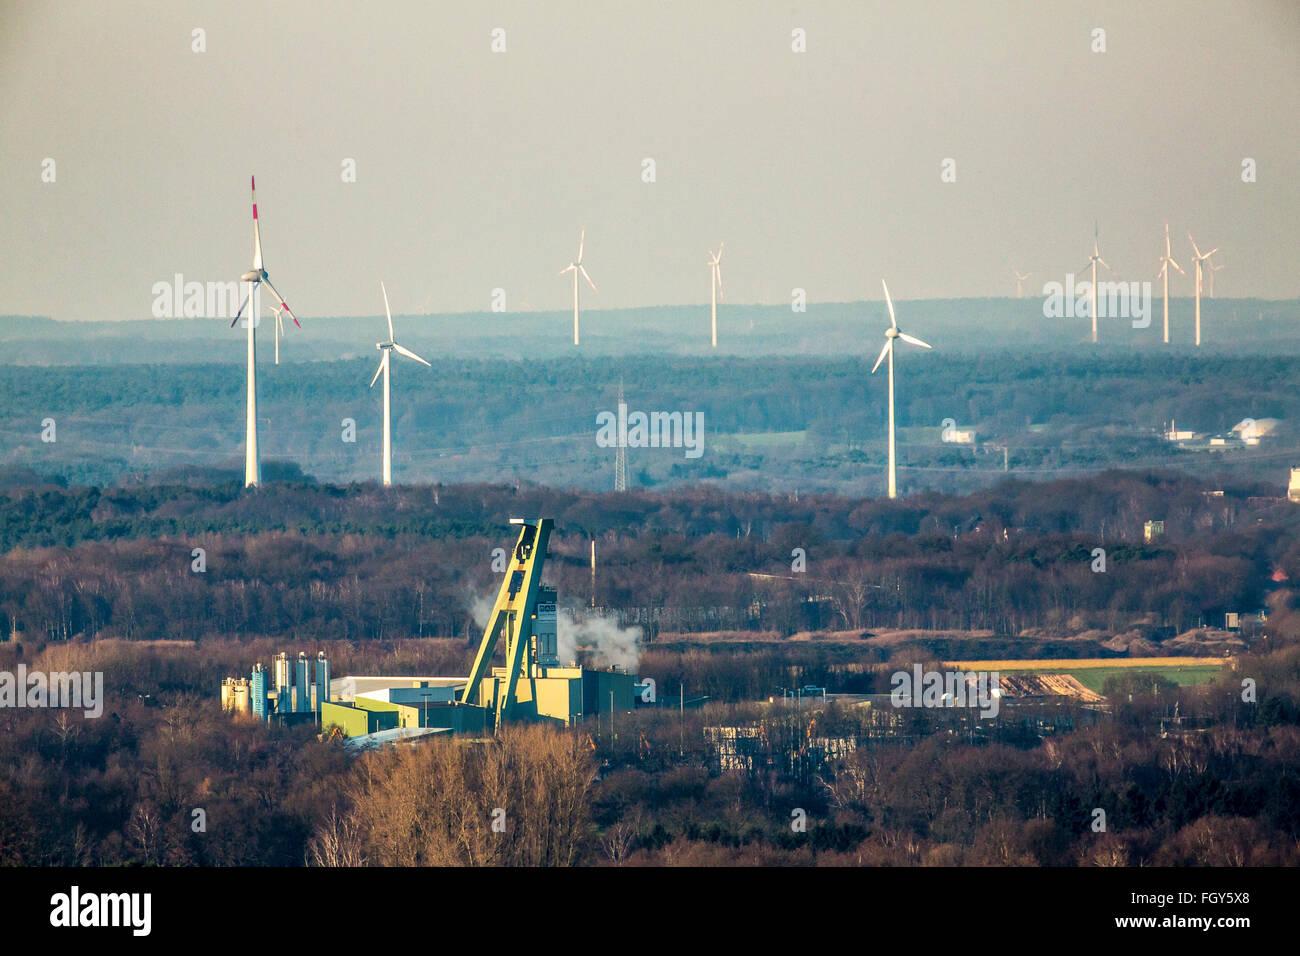 Mine Tower of the mine Prosper Haniel shaft 10 in Bottrop, last coal mine in Ruhr area, will in 2018 closed, wind - Stock Image